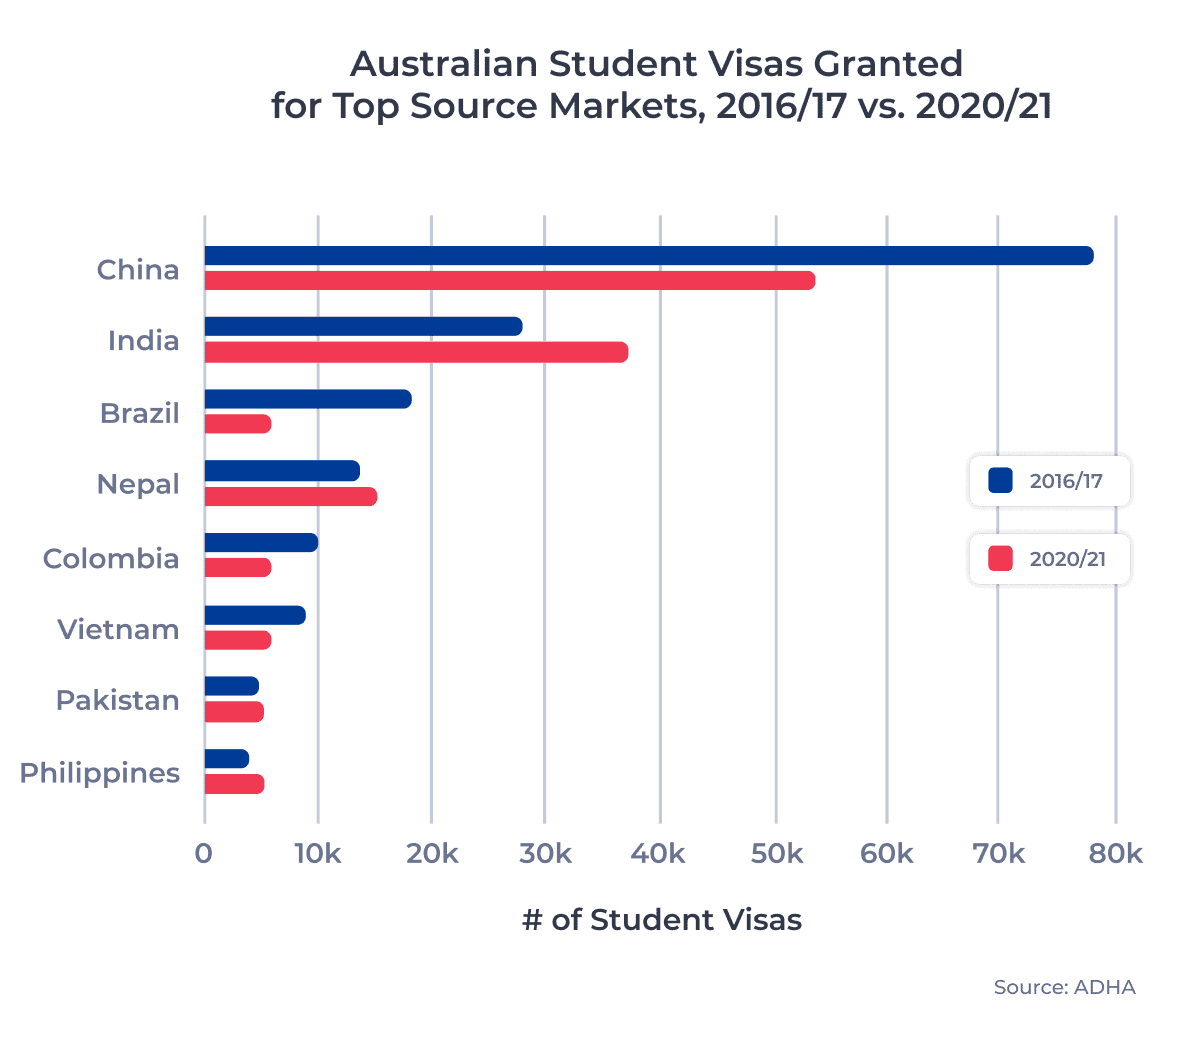 Australian Student Visas Granted for Top Source Markets, 2016/17 vs. 2020/21